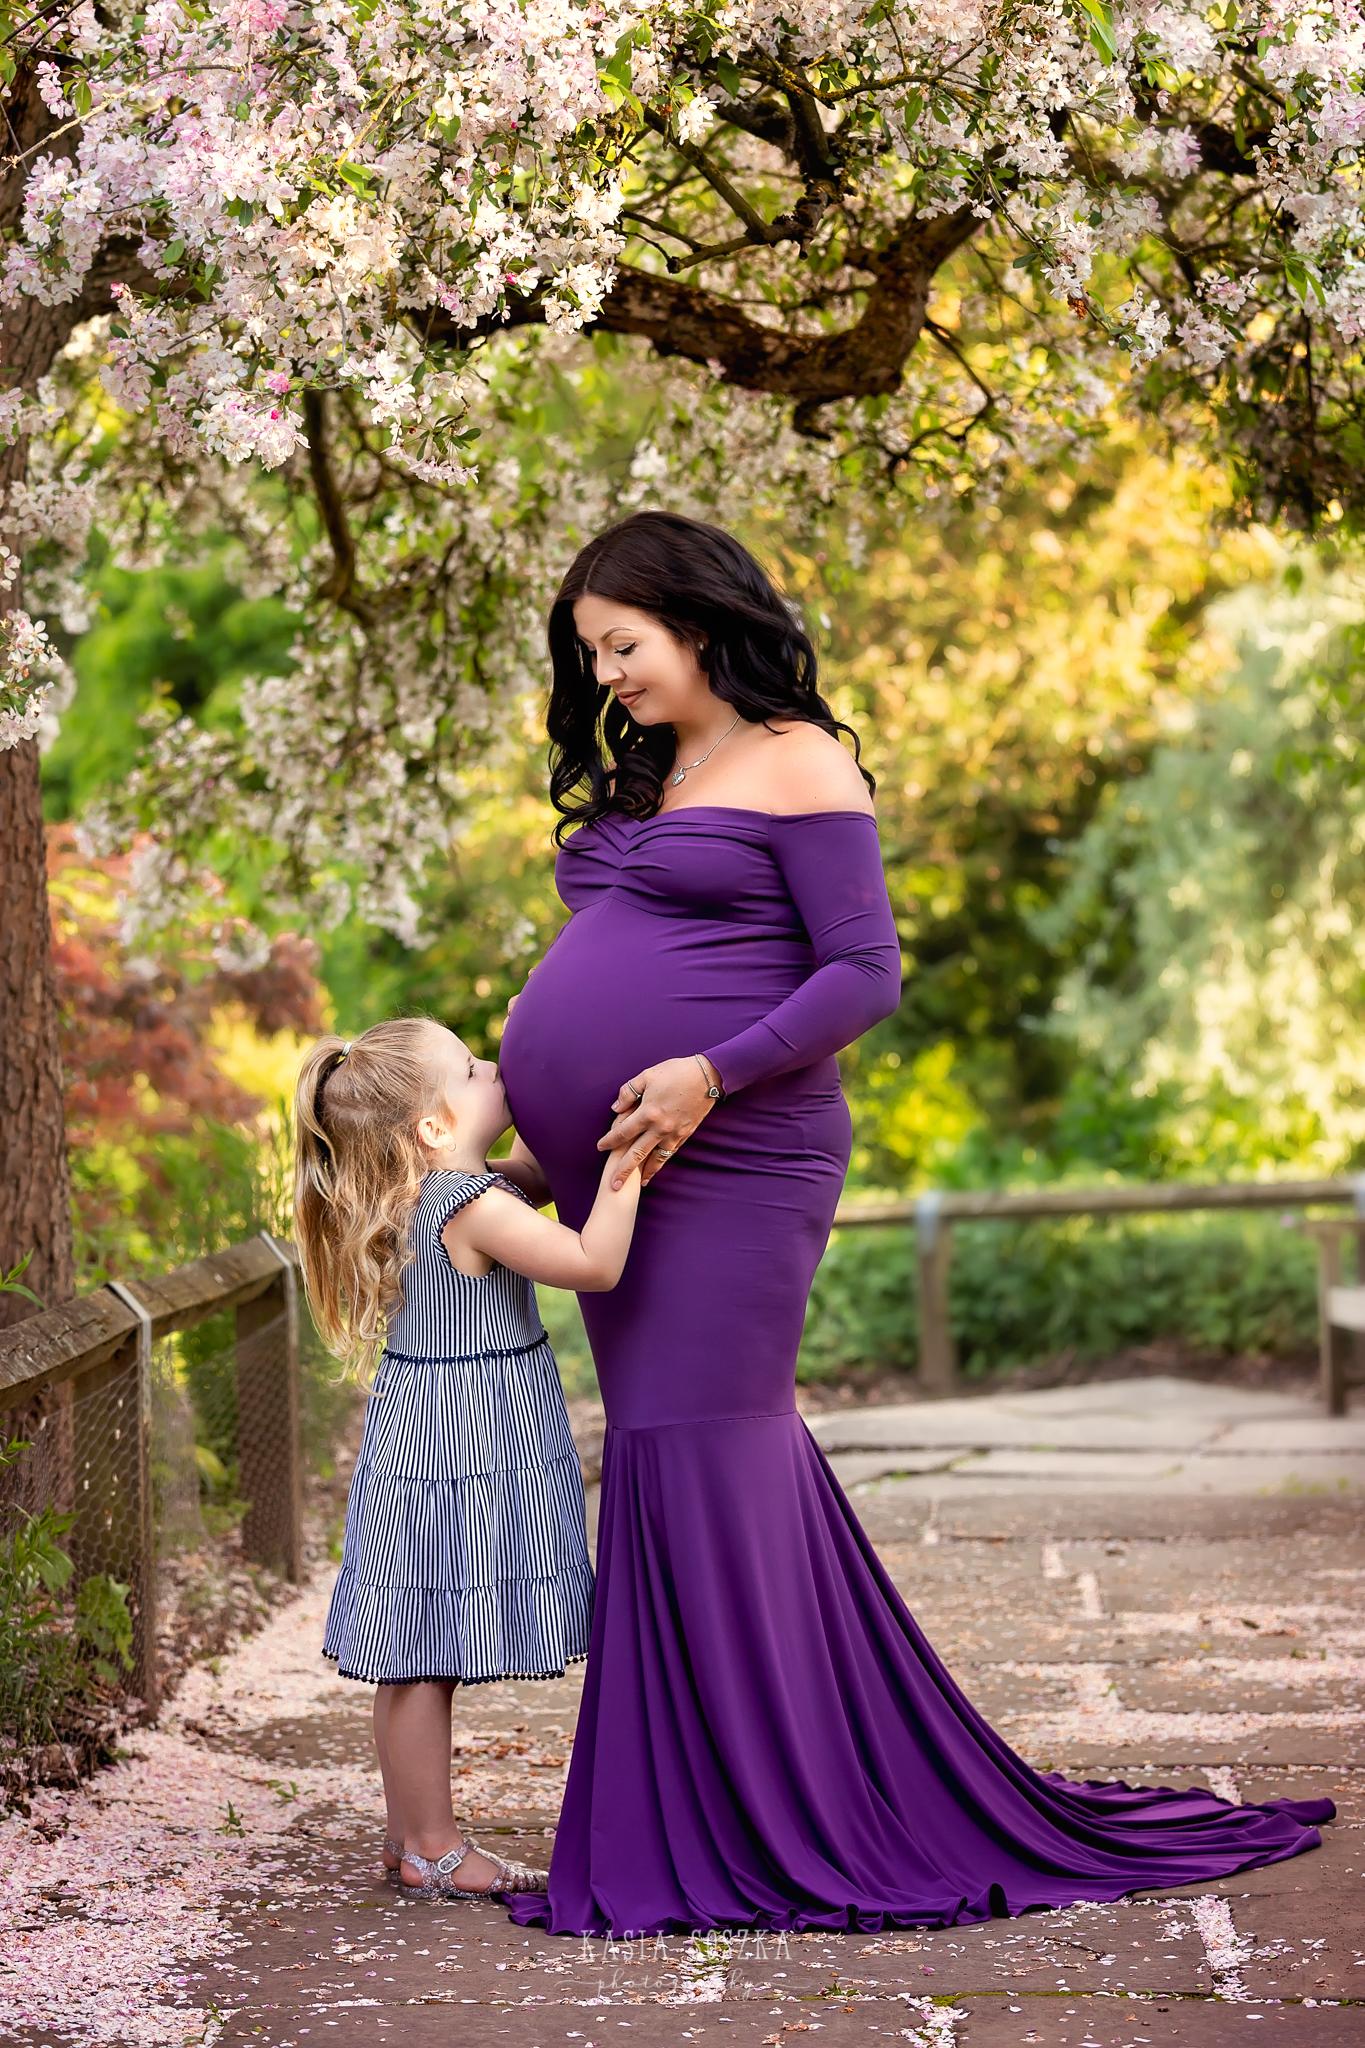 Leeds maternity photography Leeds Bradford York Harrogate maternity photographer:little girl kissing her pregnant mummy's belly in a beautiful park